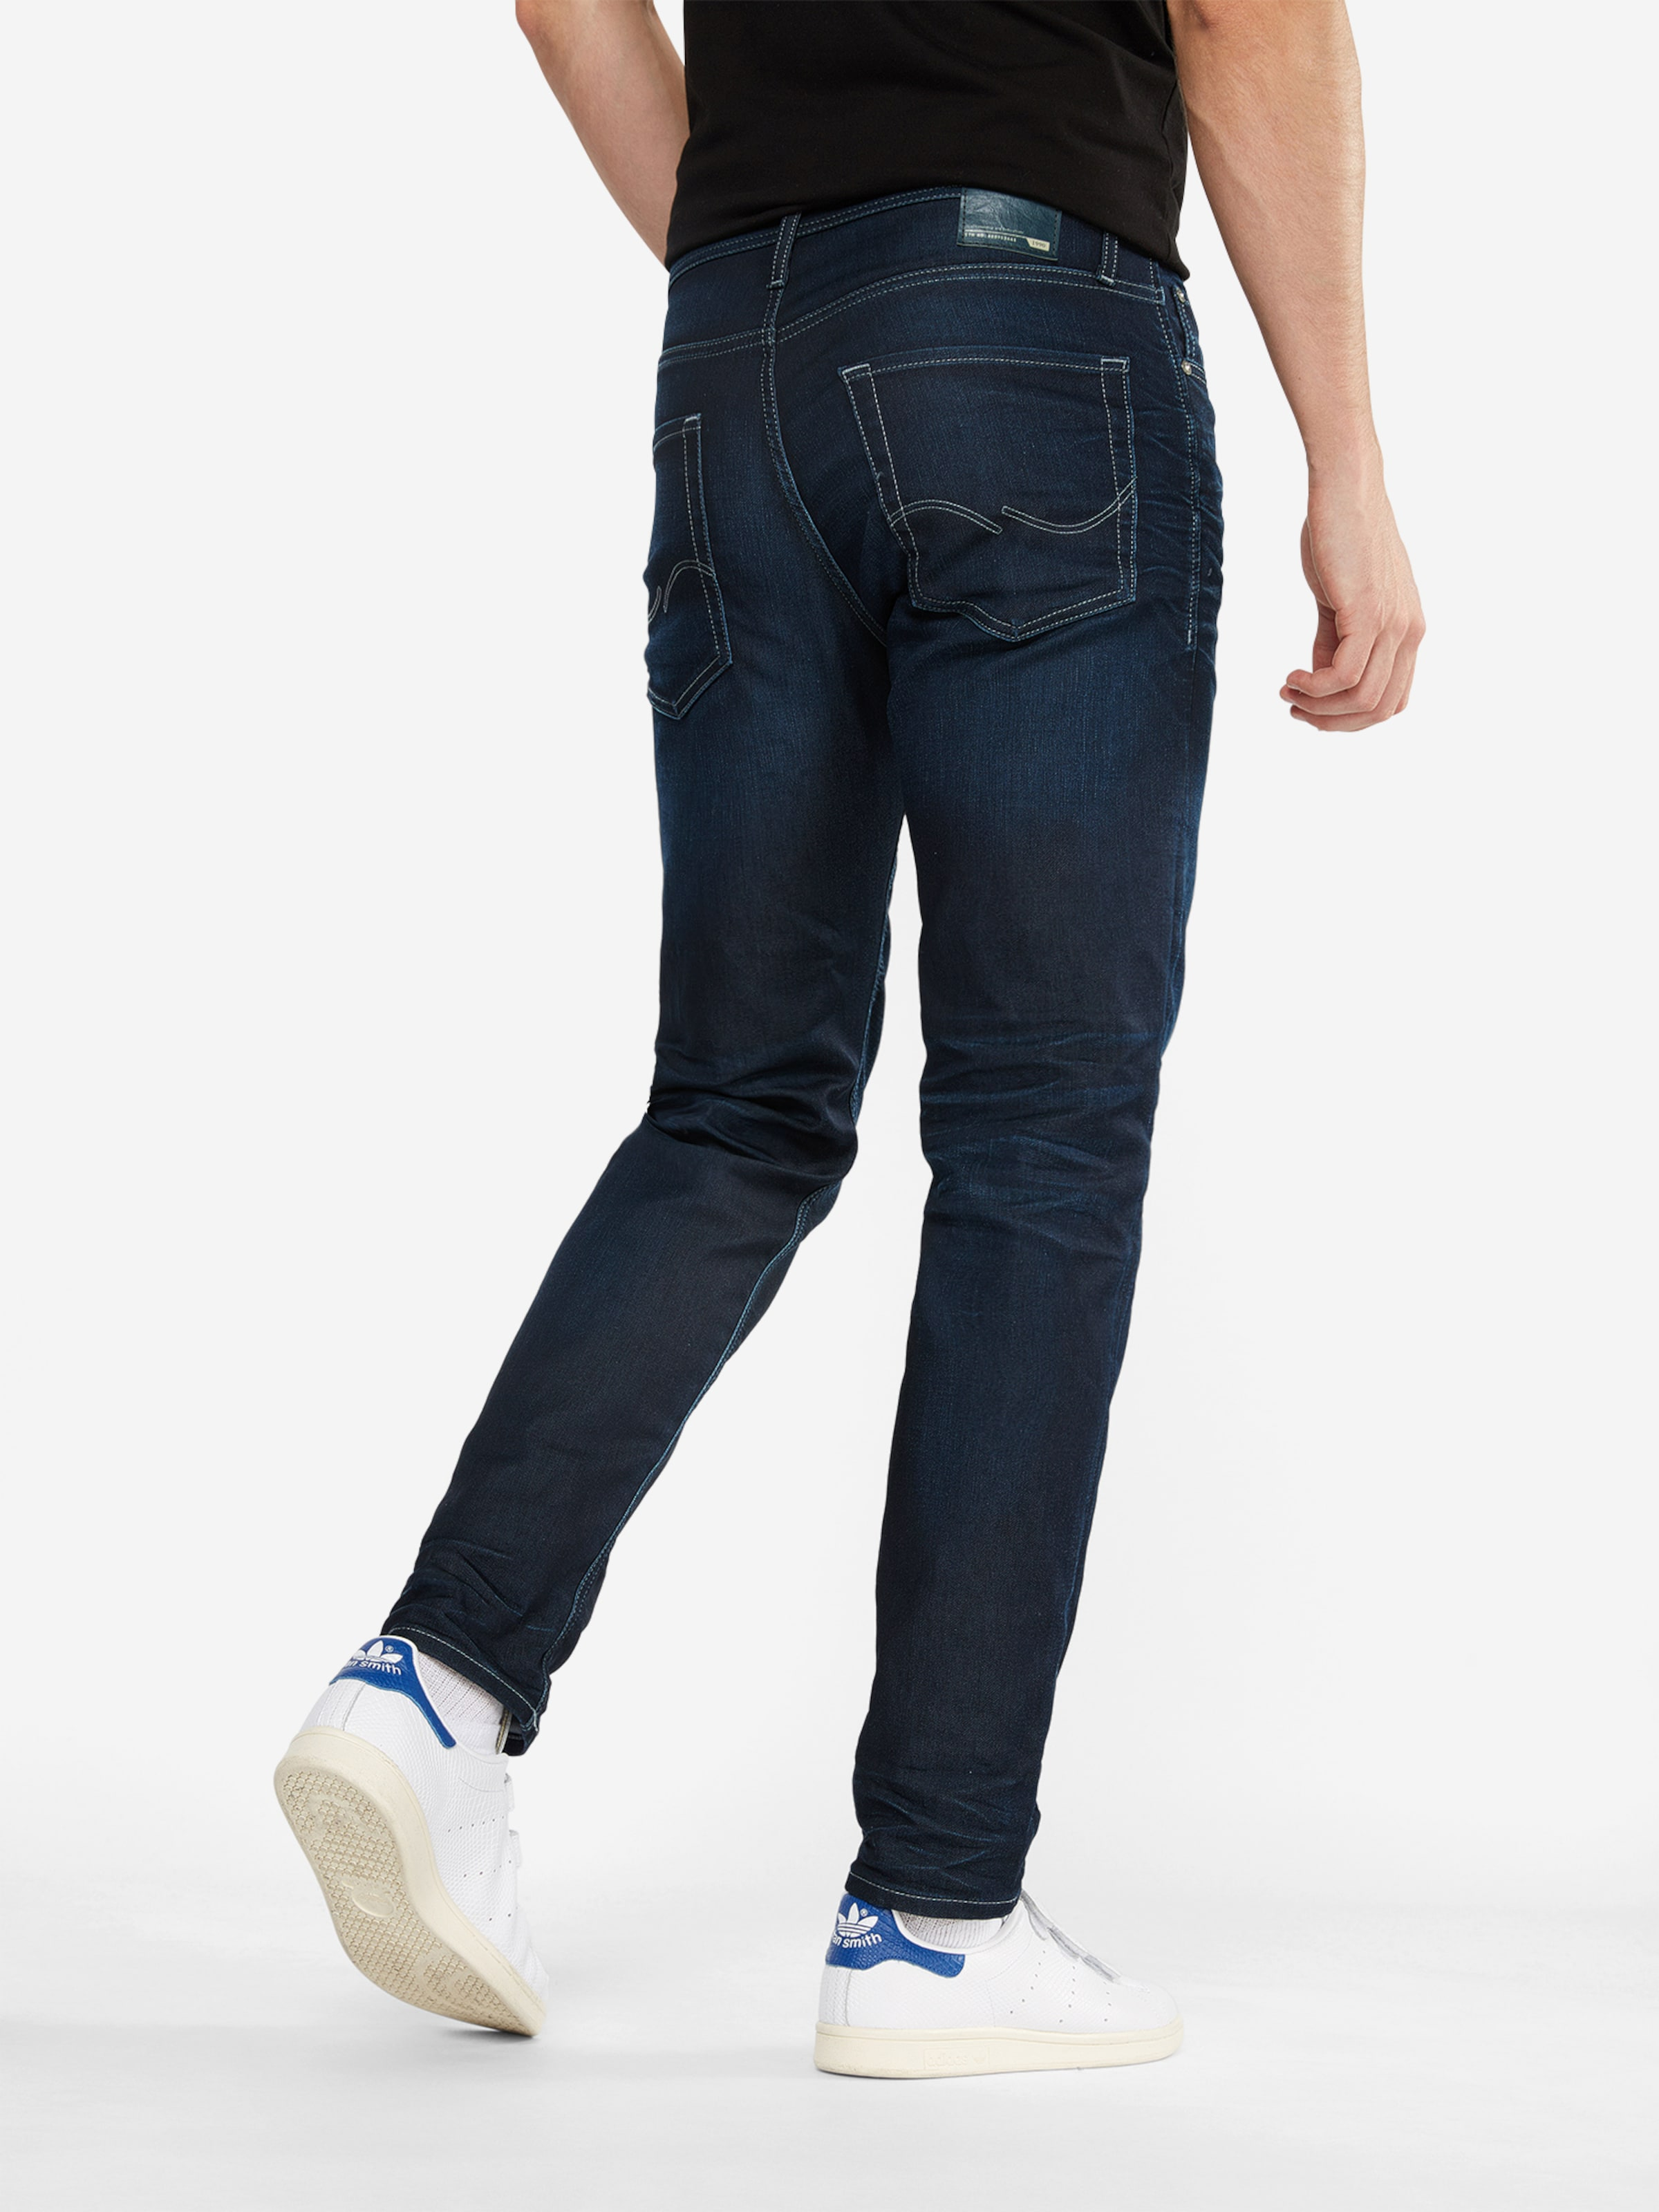 Jones Jeans 097' Jos Fit 'mike Jackamp; Denim Org Blue In Comfort dBthQsCxr